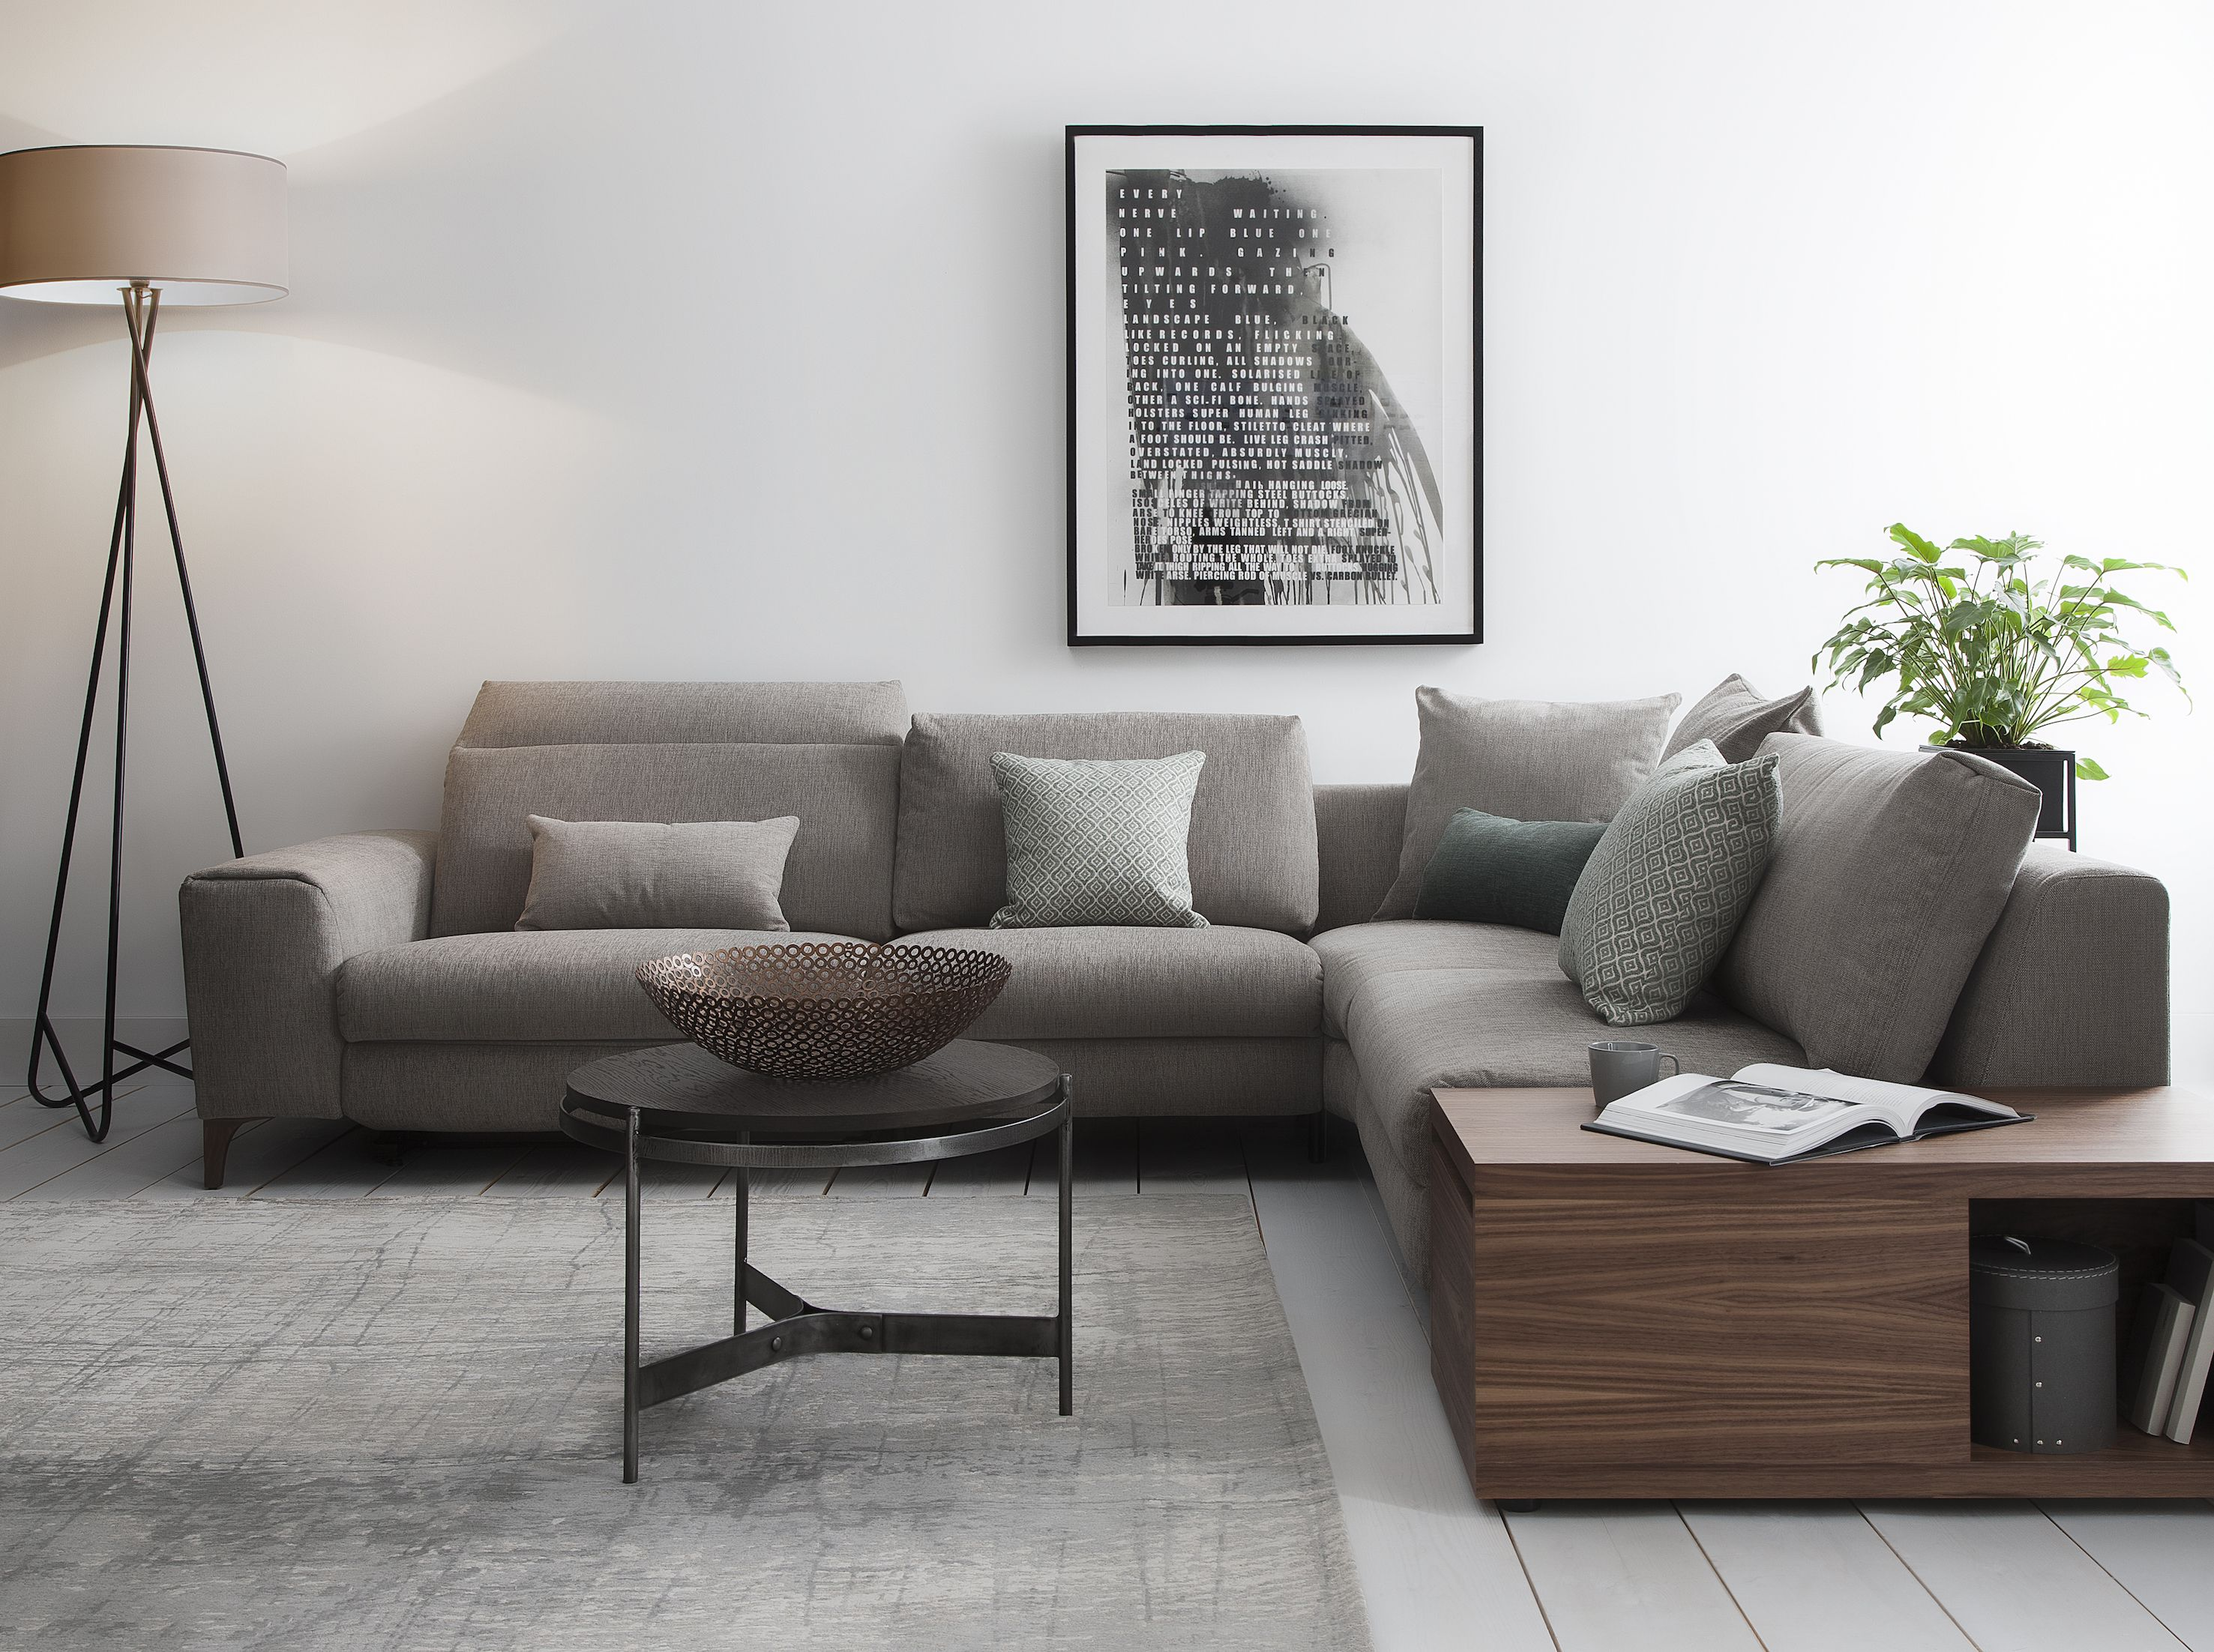 Check out our new ROM Donato sofa Signature